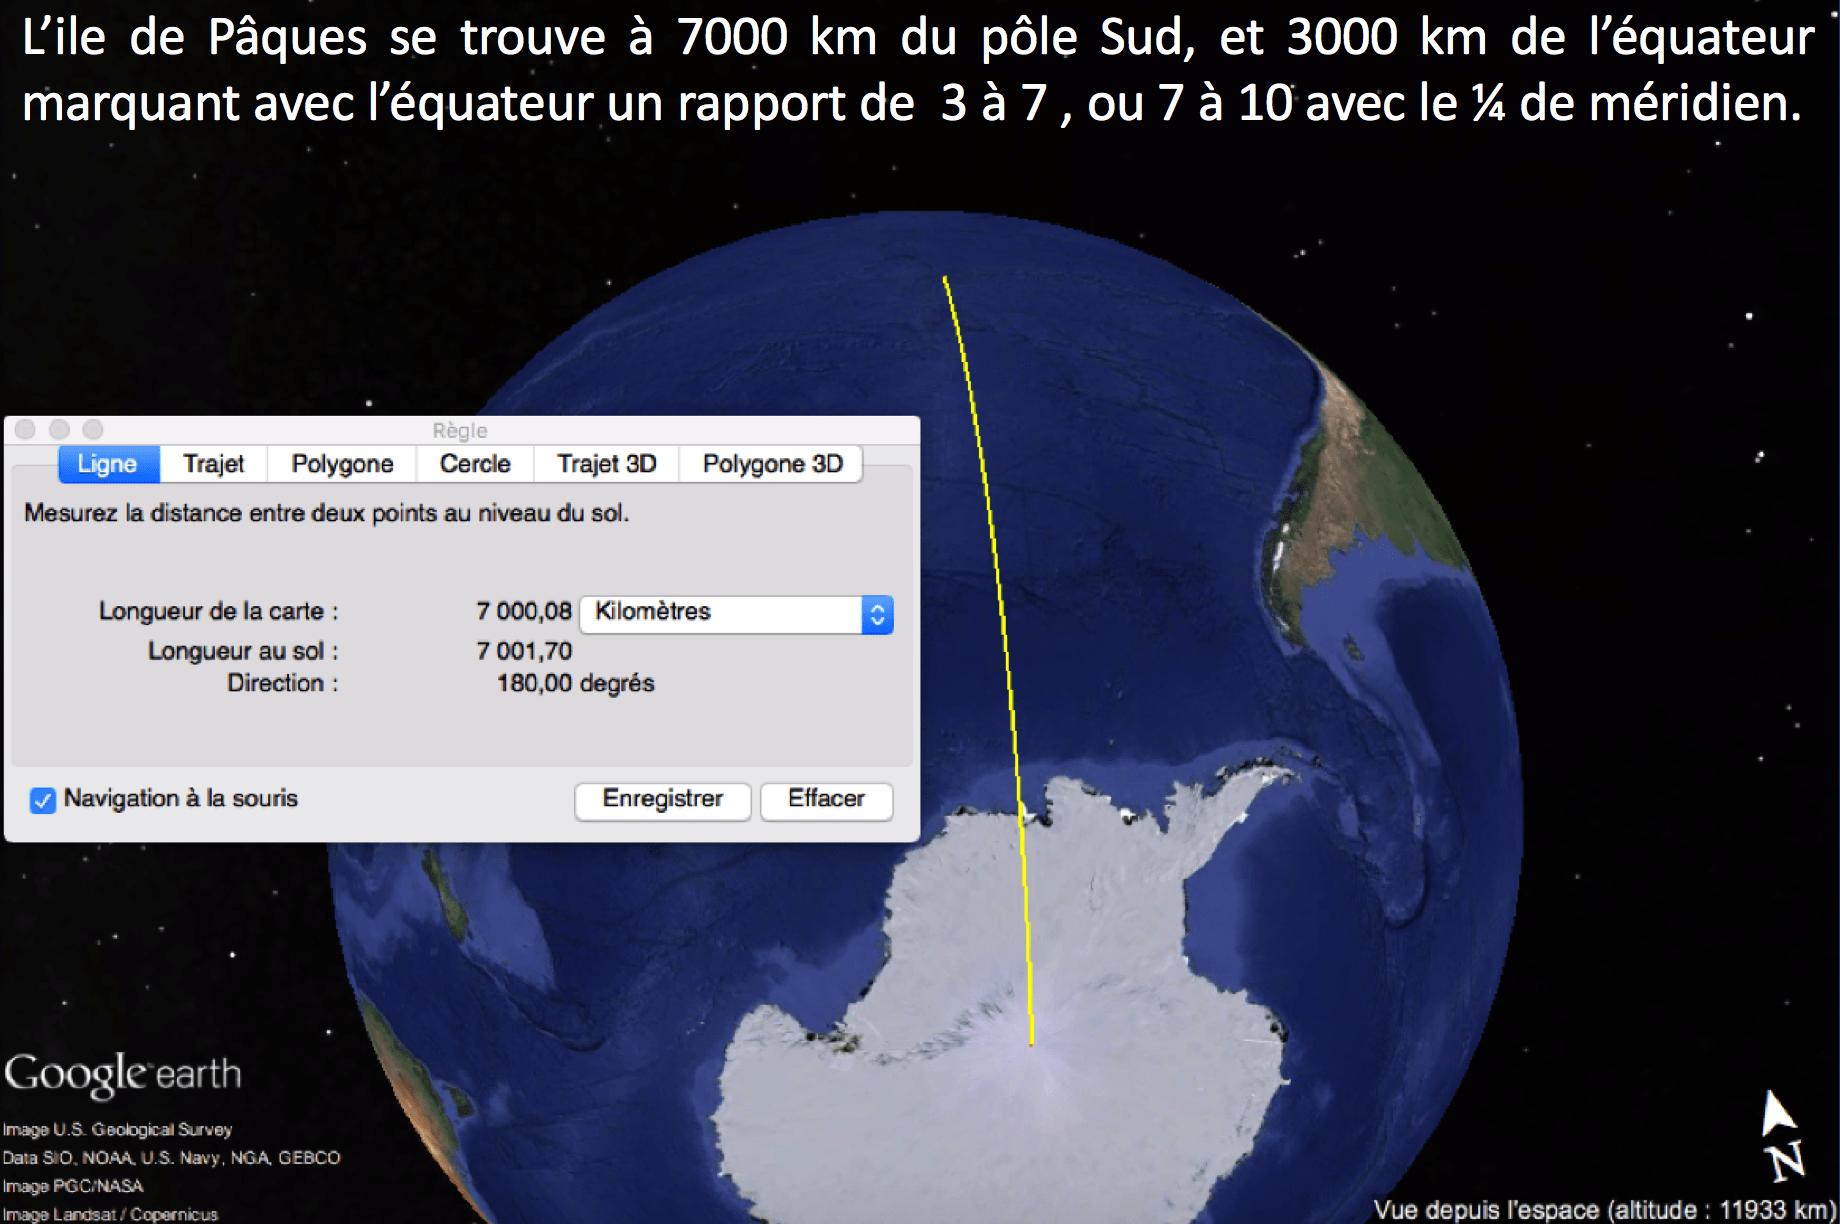 2017-04-28 15:37:46